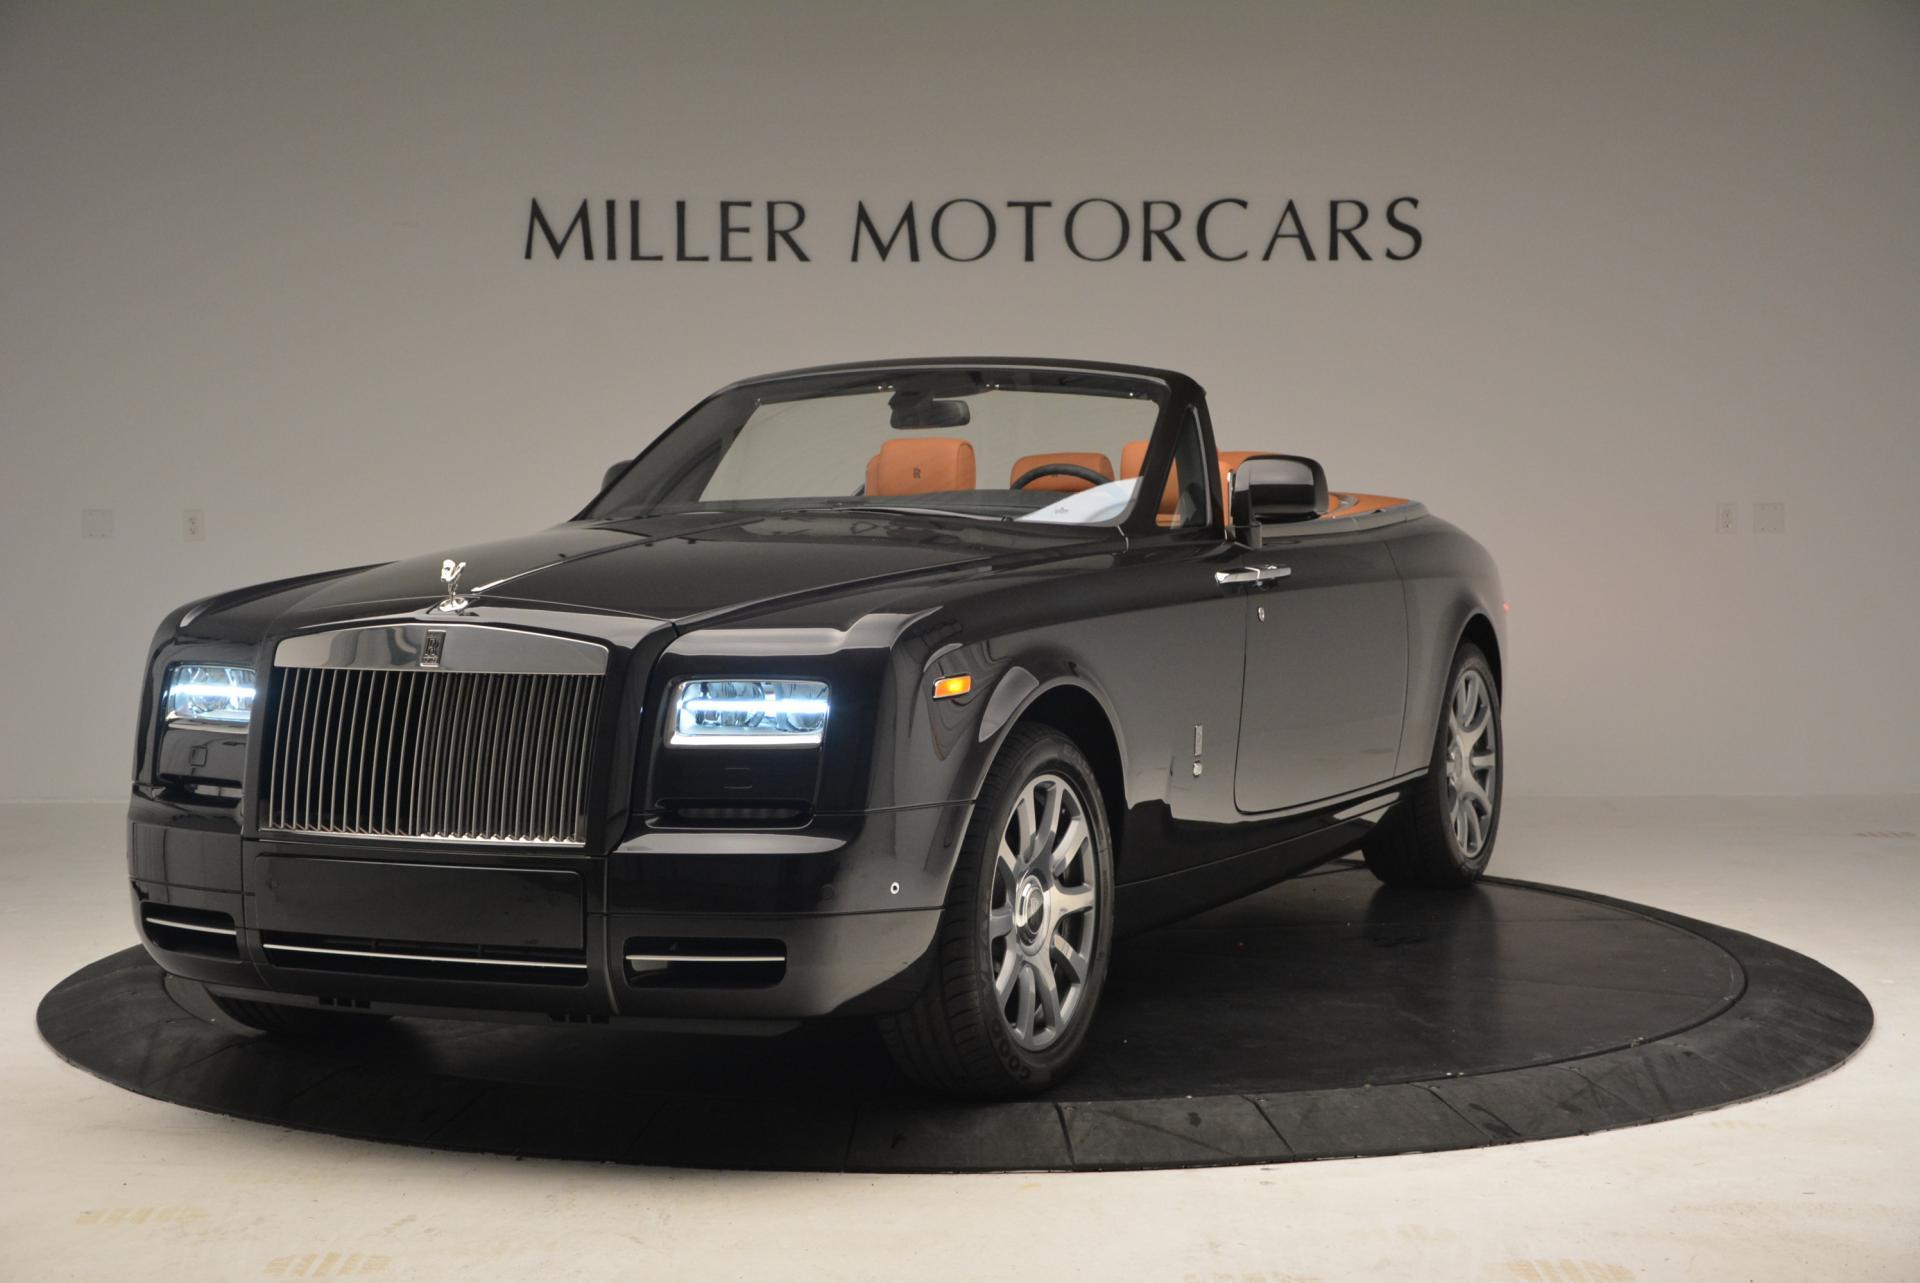 New 2016 Rolls-Royce Phantom Drophead Coupe Bespoke for sale Sold at Maserati of Westport in Westport CT 06880 1